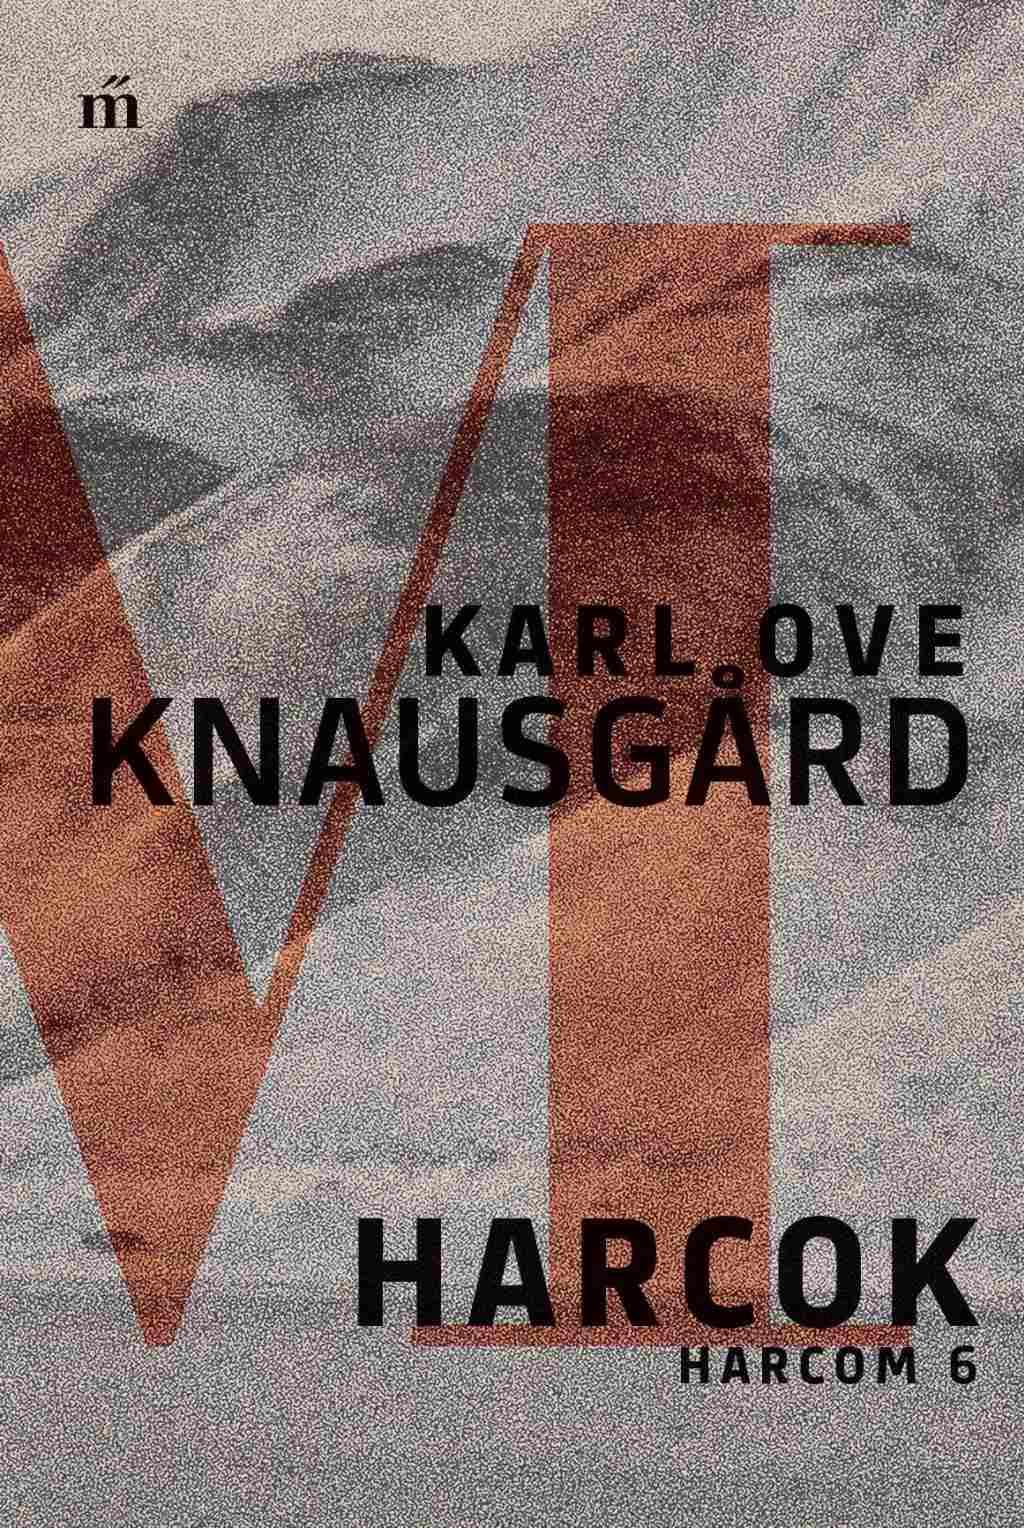 Karl Ove Knausgard - Harcok - Harcom 6.